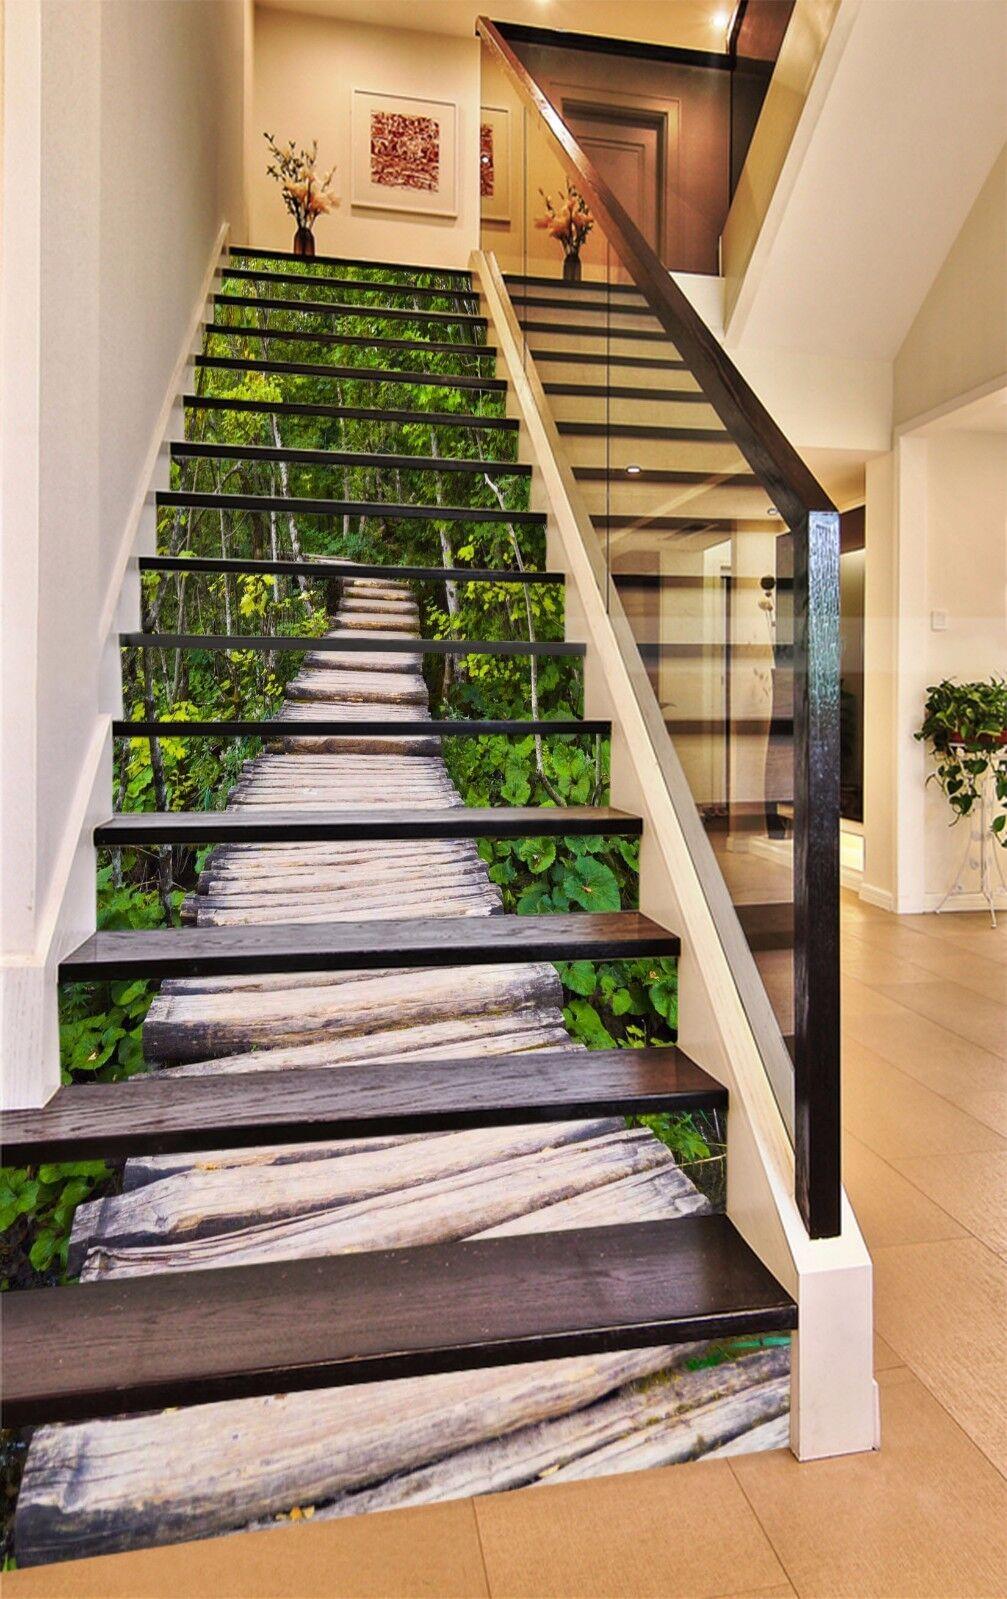 3D Bridg Forest 685 Stair Risers Decoration Photo Mural Vinyl Decal Wallpaper UK